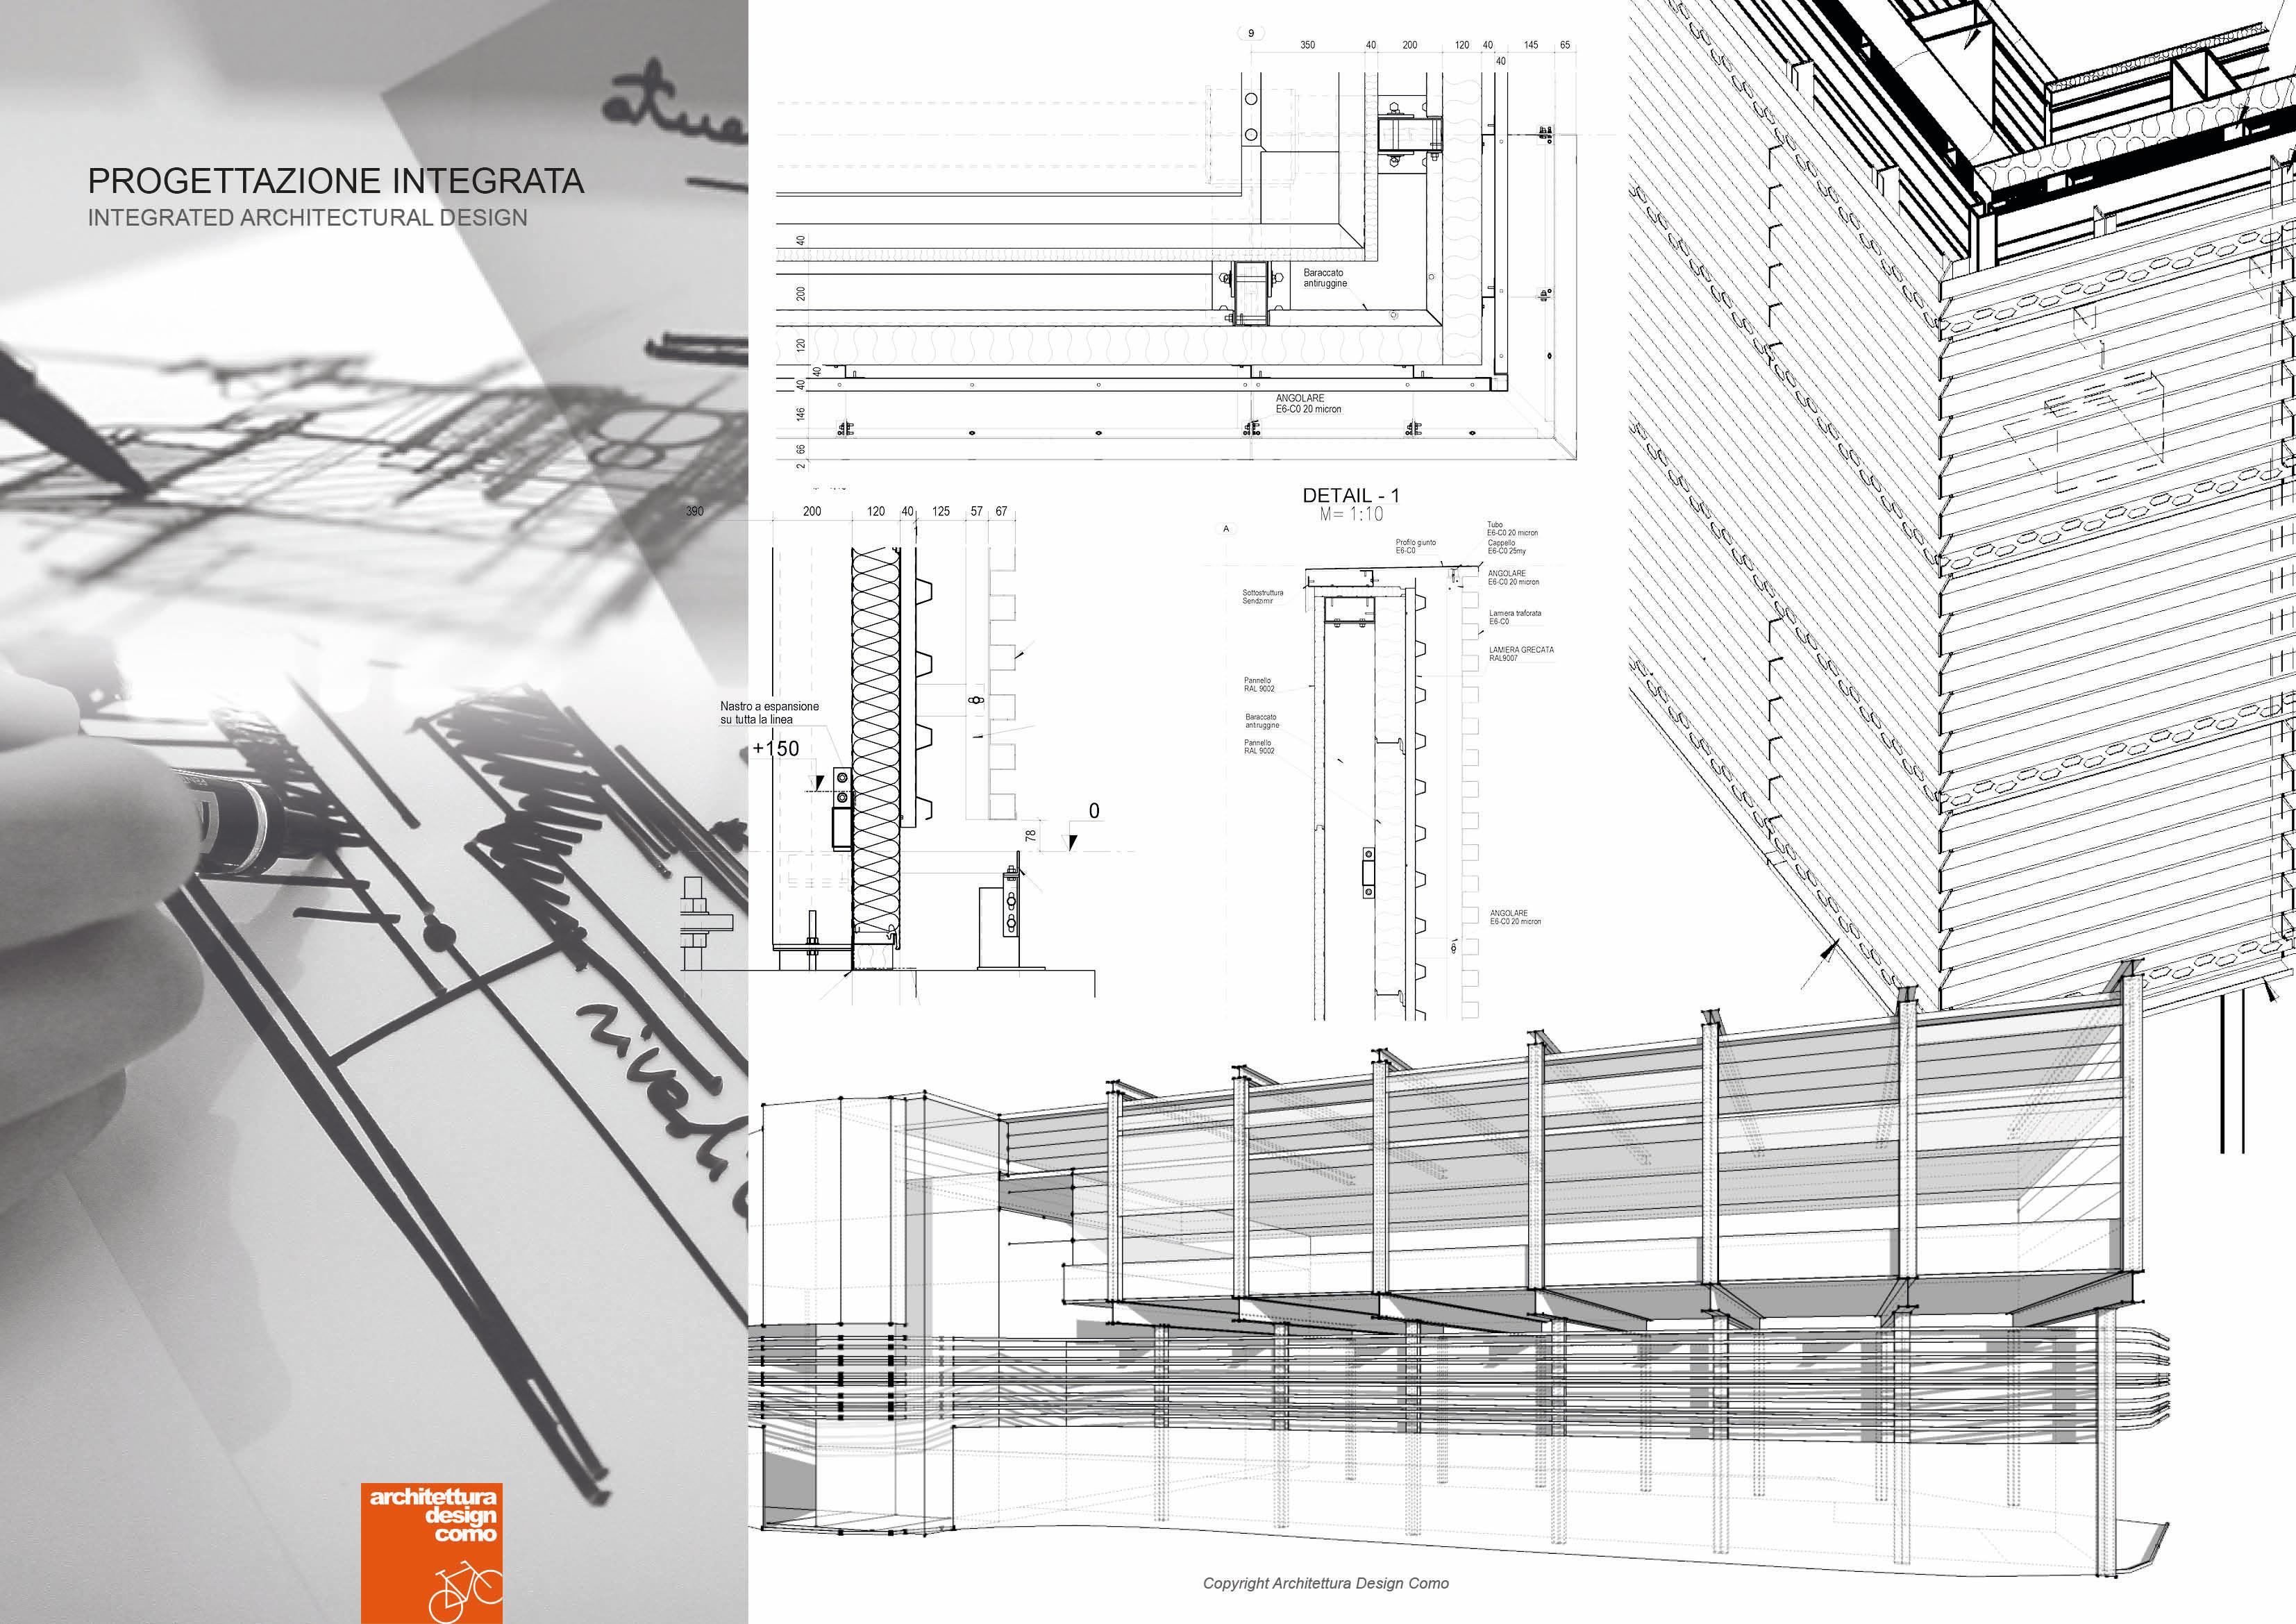 Brochure studio rev 3 20161114 prova5